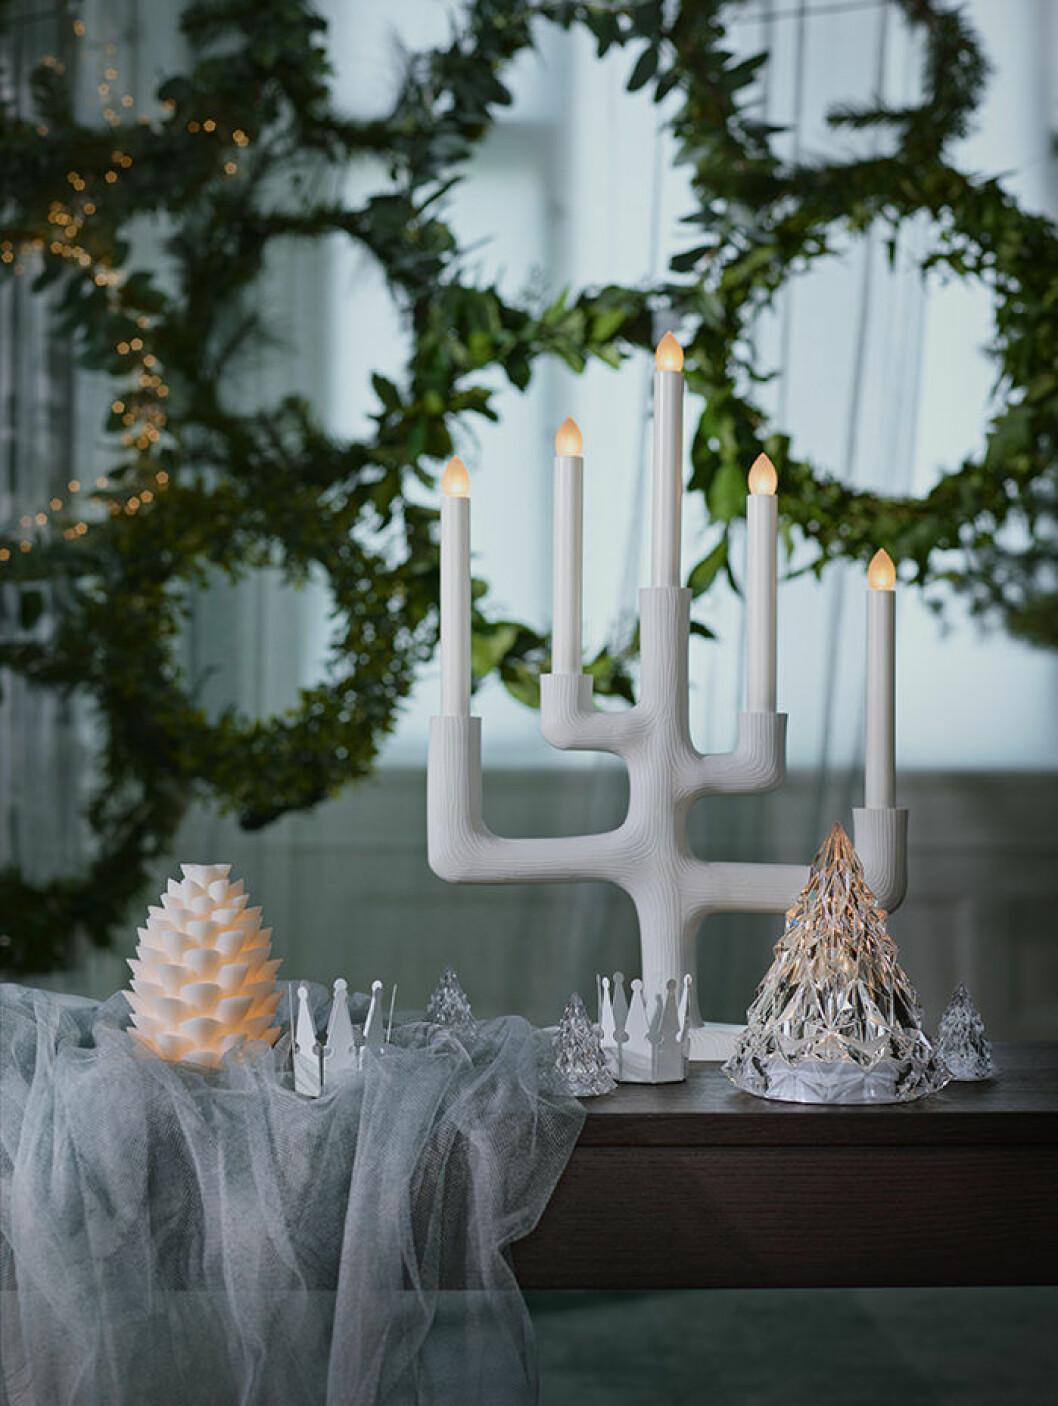 Vit ljusstake från Ikea, vintern 2018